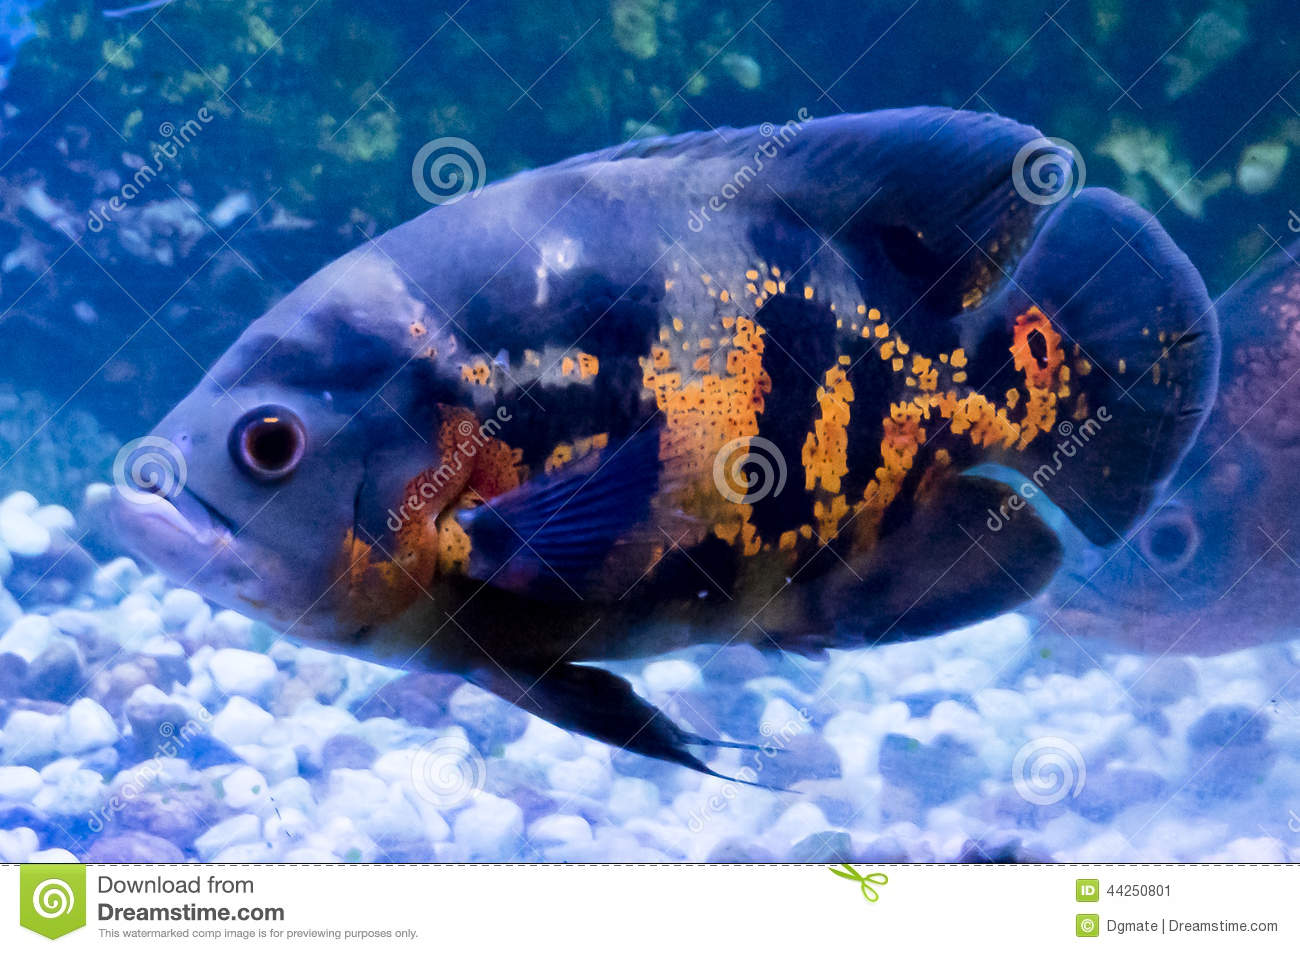 Oscar (Fish) clipart #8, Download drawings